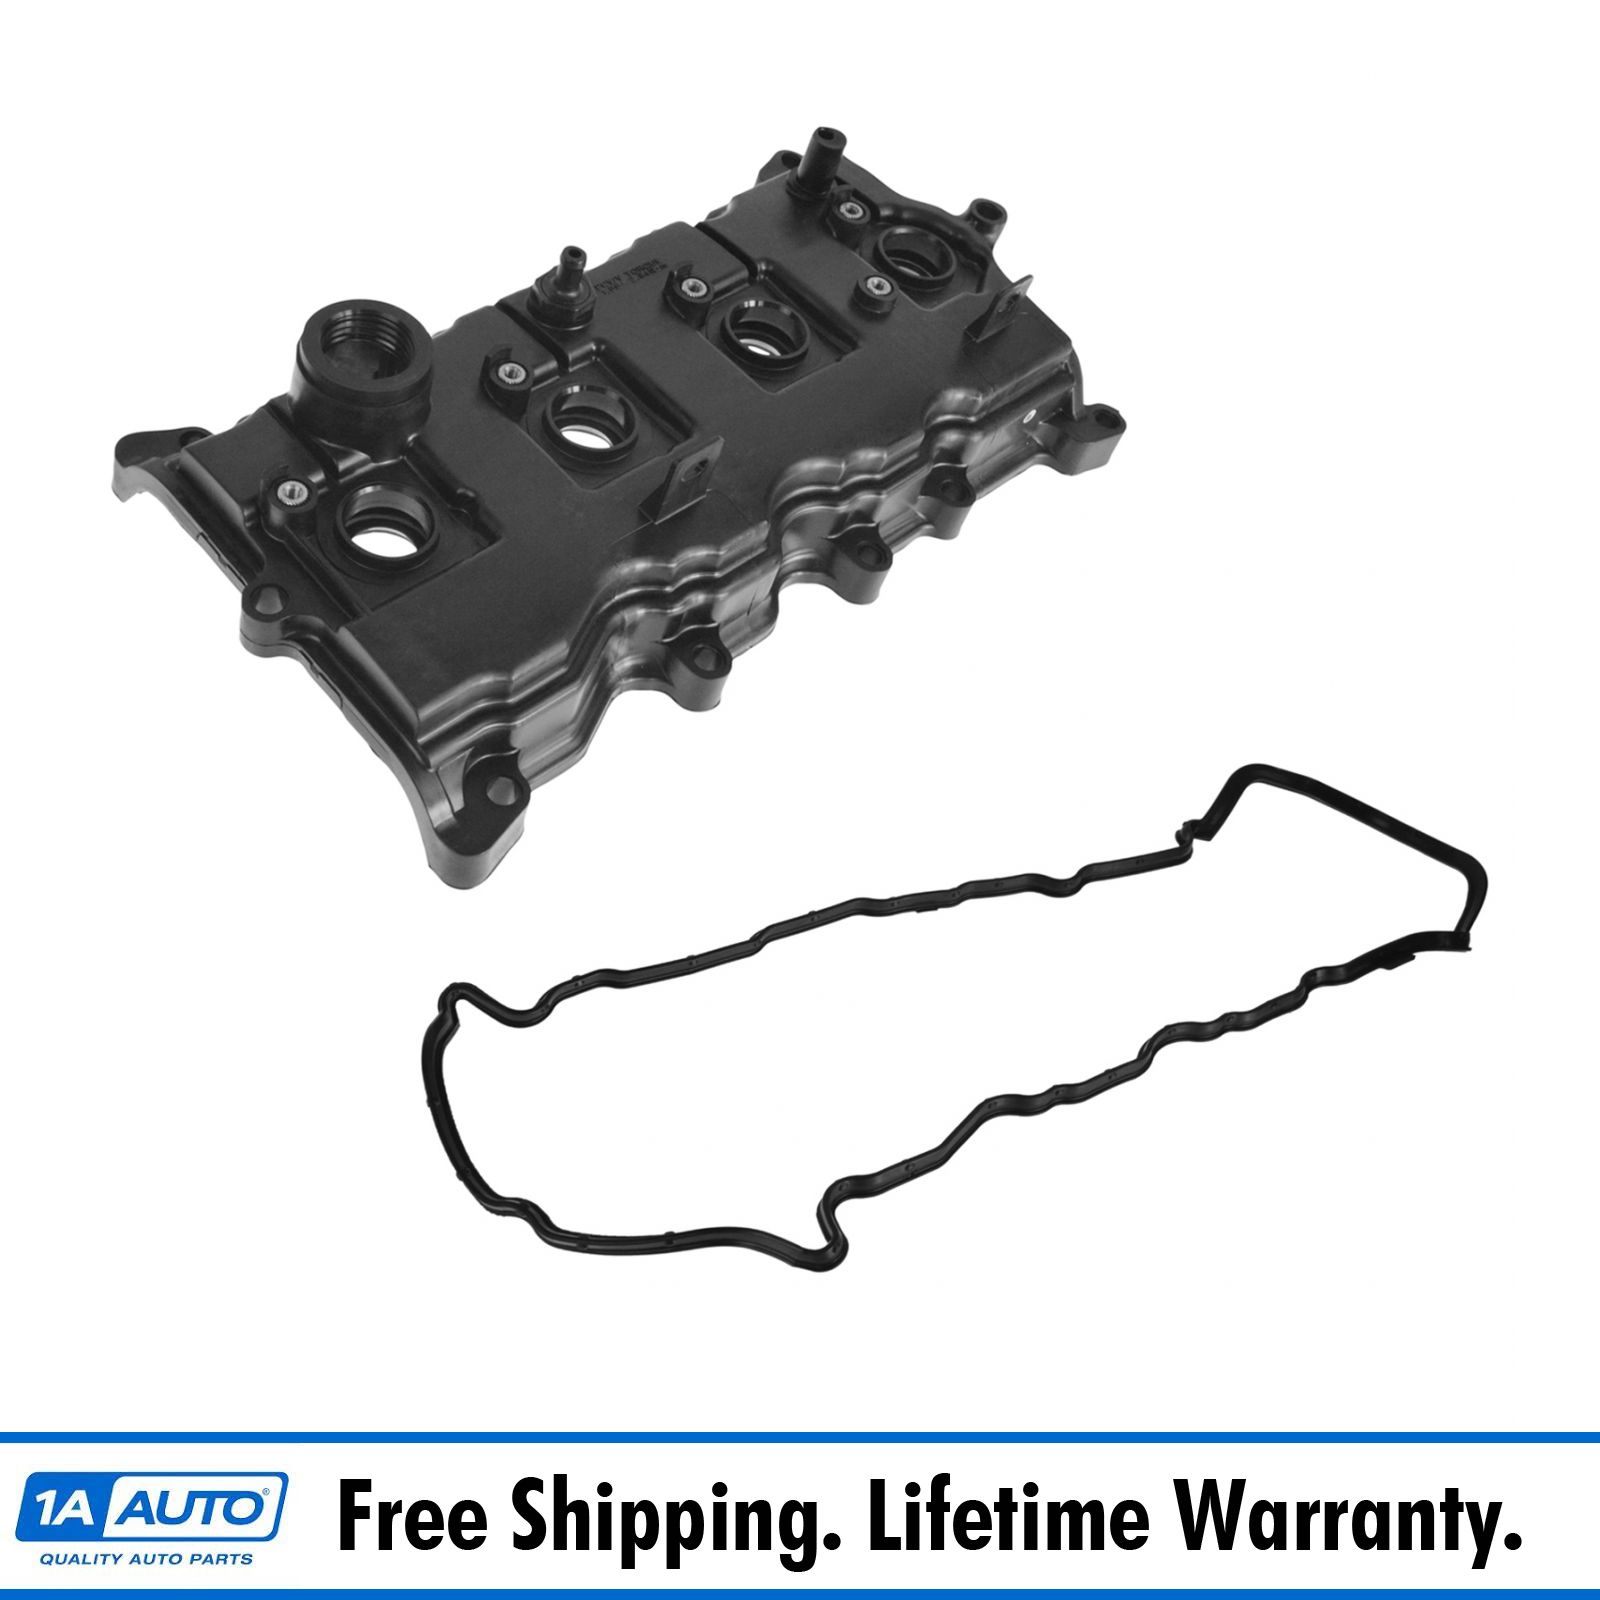 For 2007-2012 Nissan Altima Sentra SE-R 2.5L QR25DE Engine Valve Cover w// Gasket